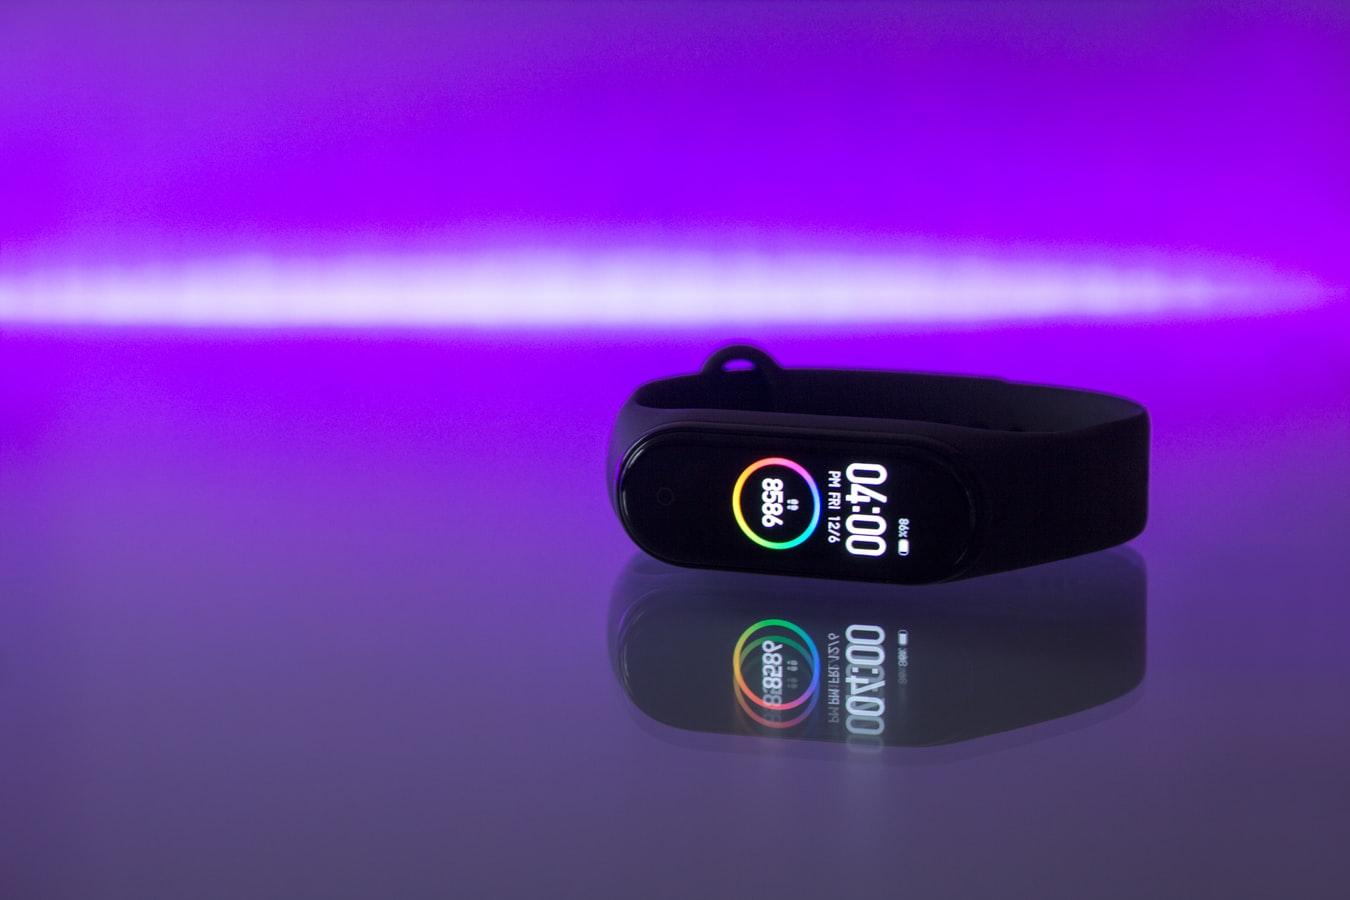 The benefits of a fitness bracelet